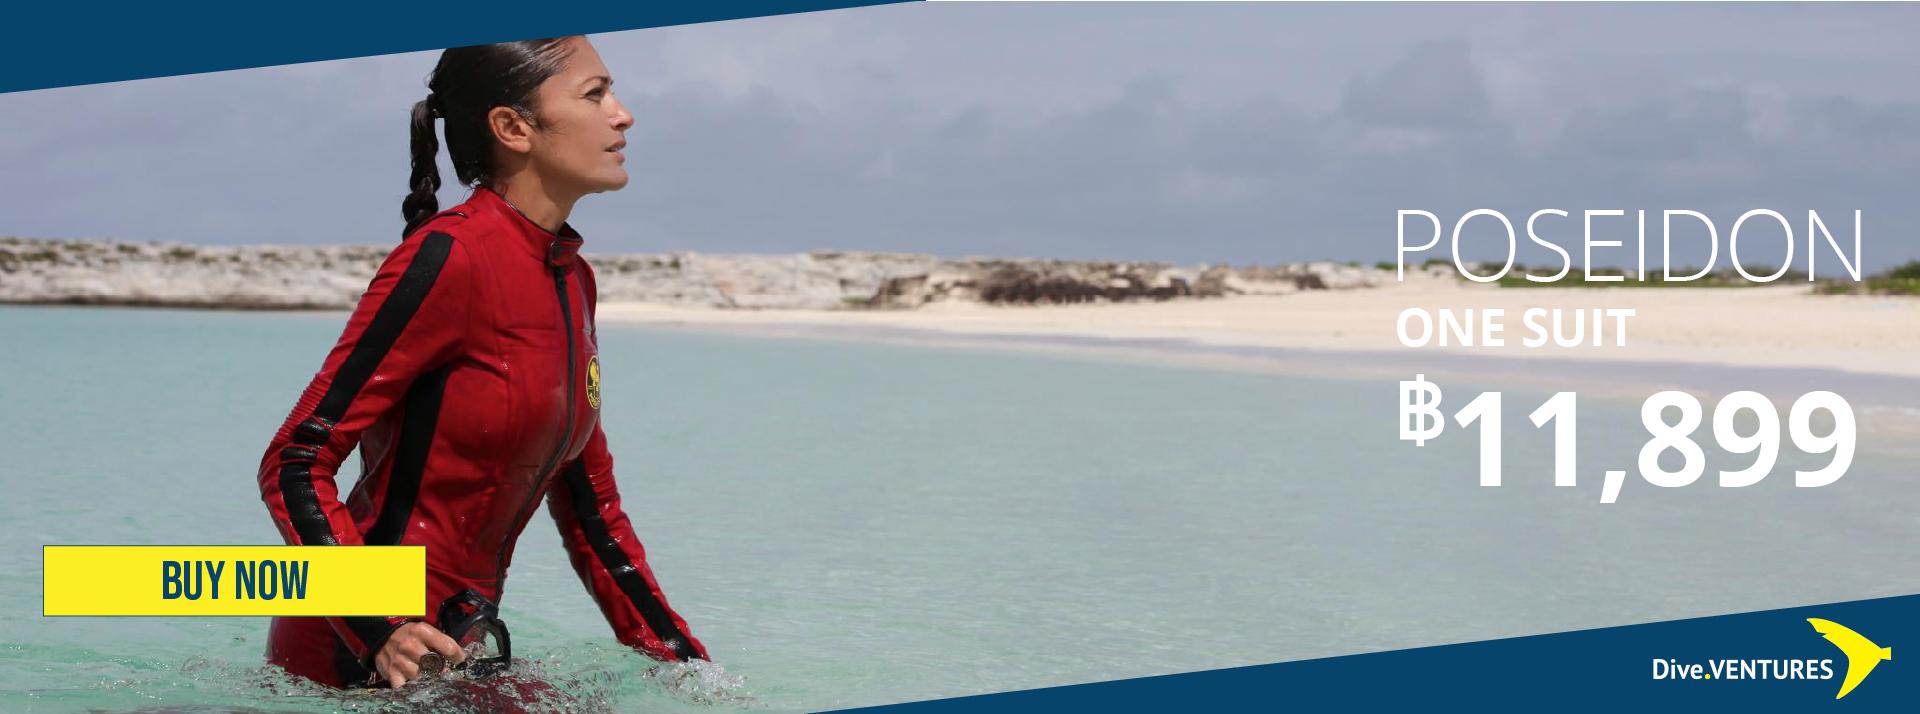 Poseidon One Suit Banner | Dive.VENTURES